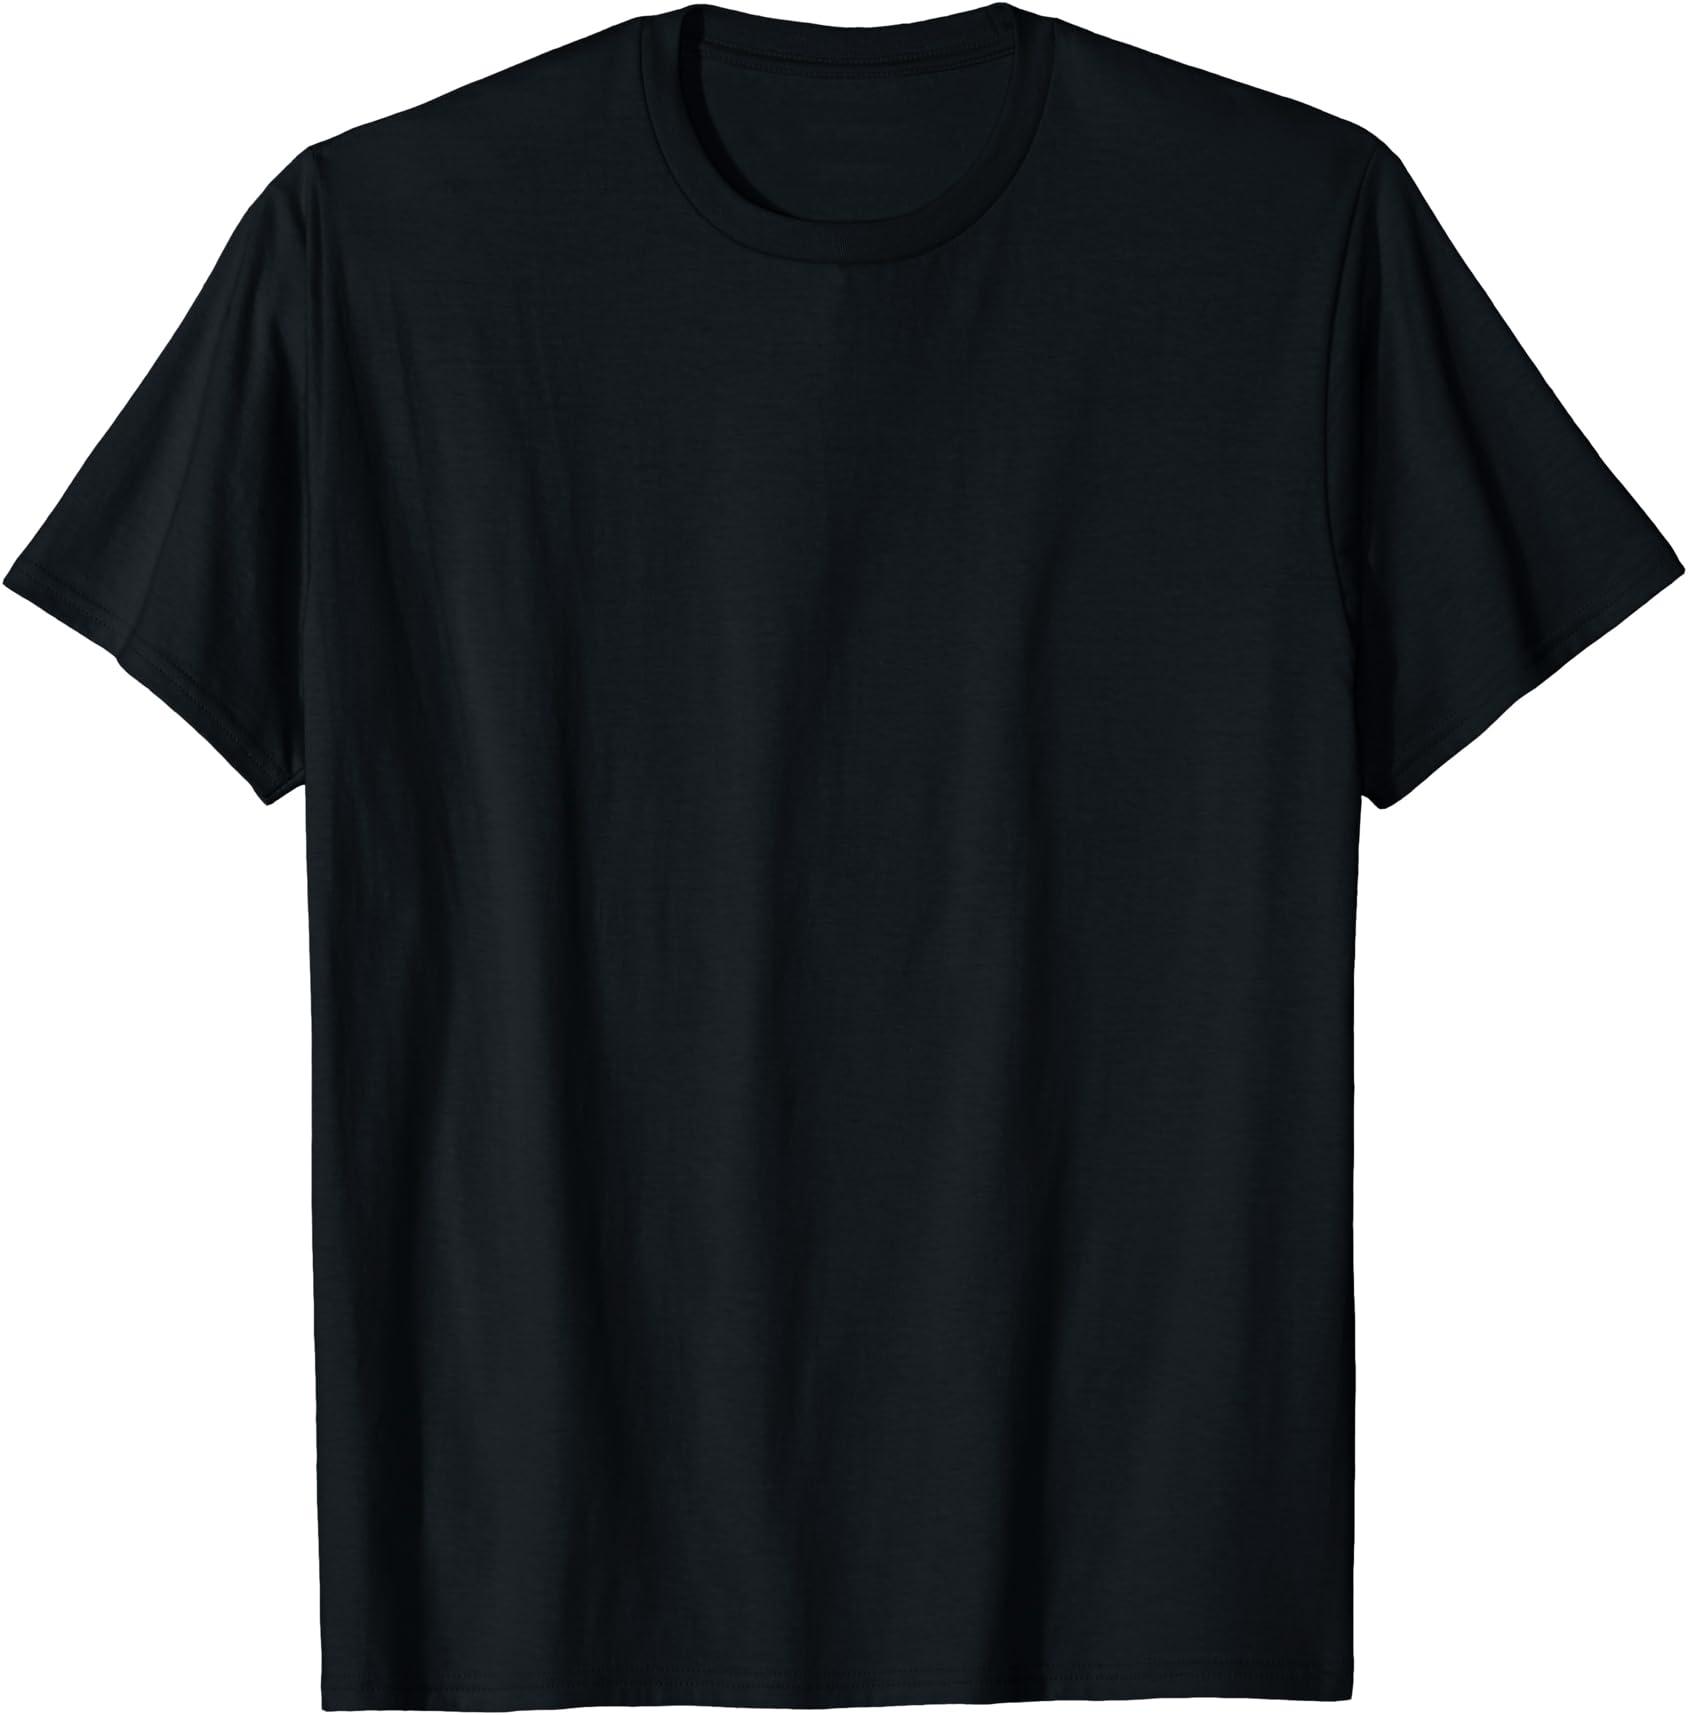 NIPSEY HUSSLE VICTORY LAP   SMALL TO 3XL BLACK OR WHITE CRENSHAW T-shirt